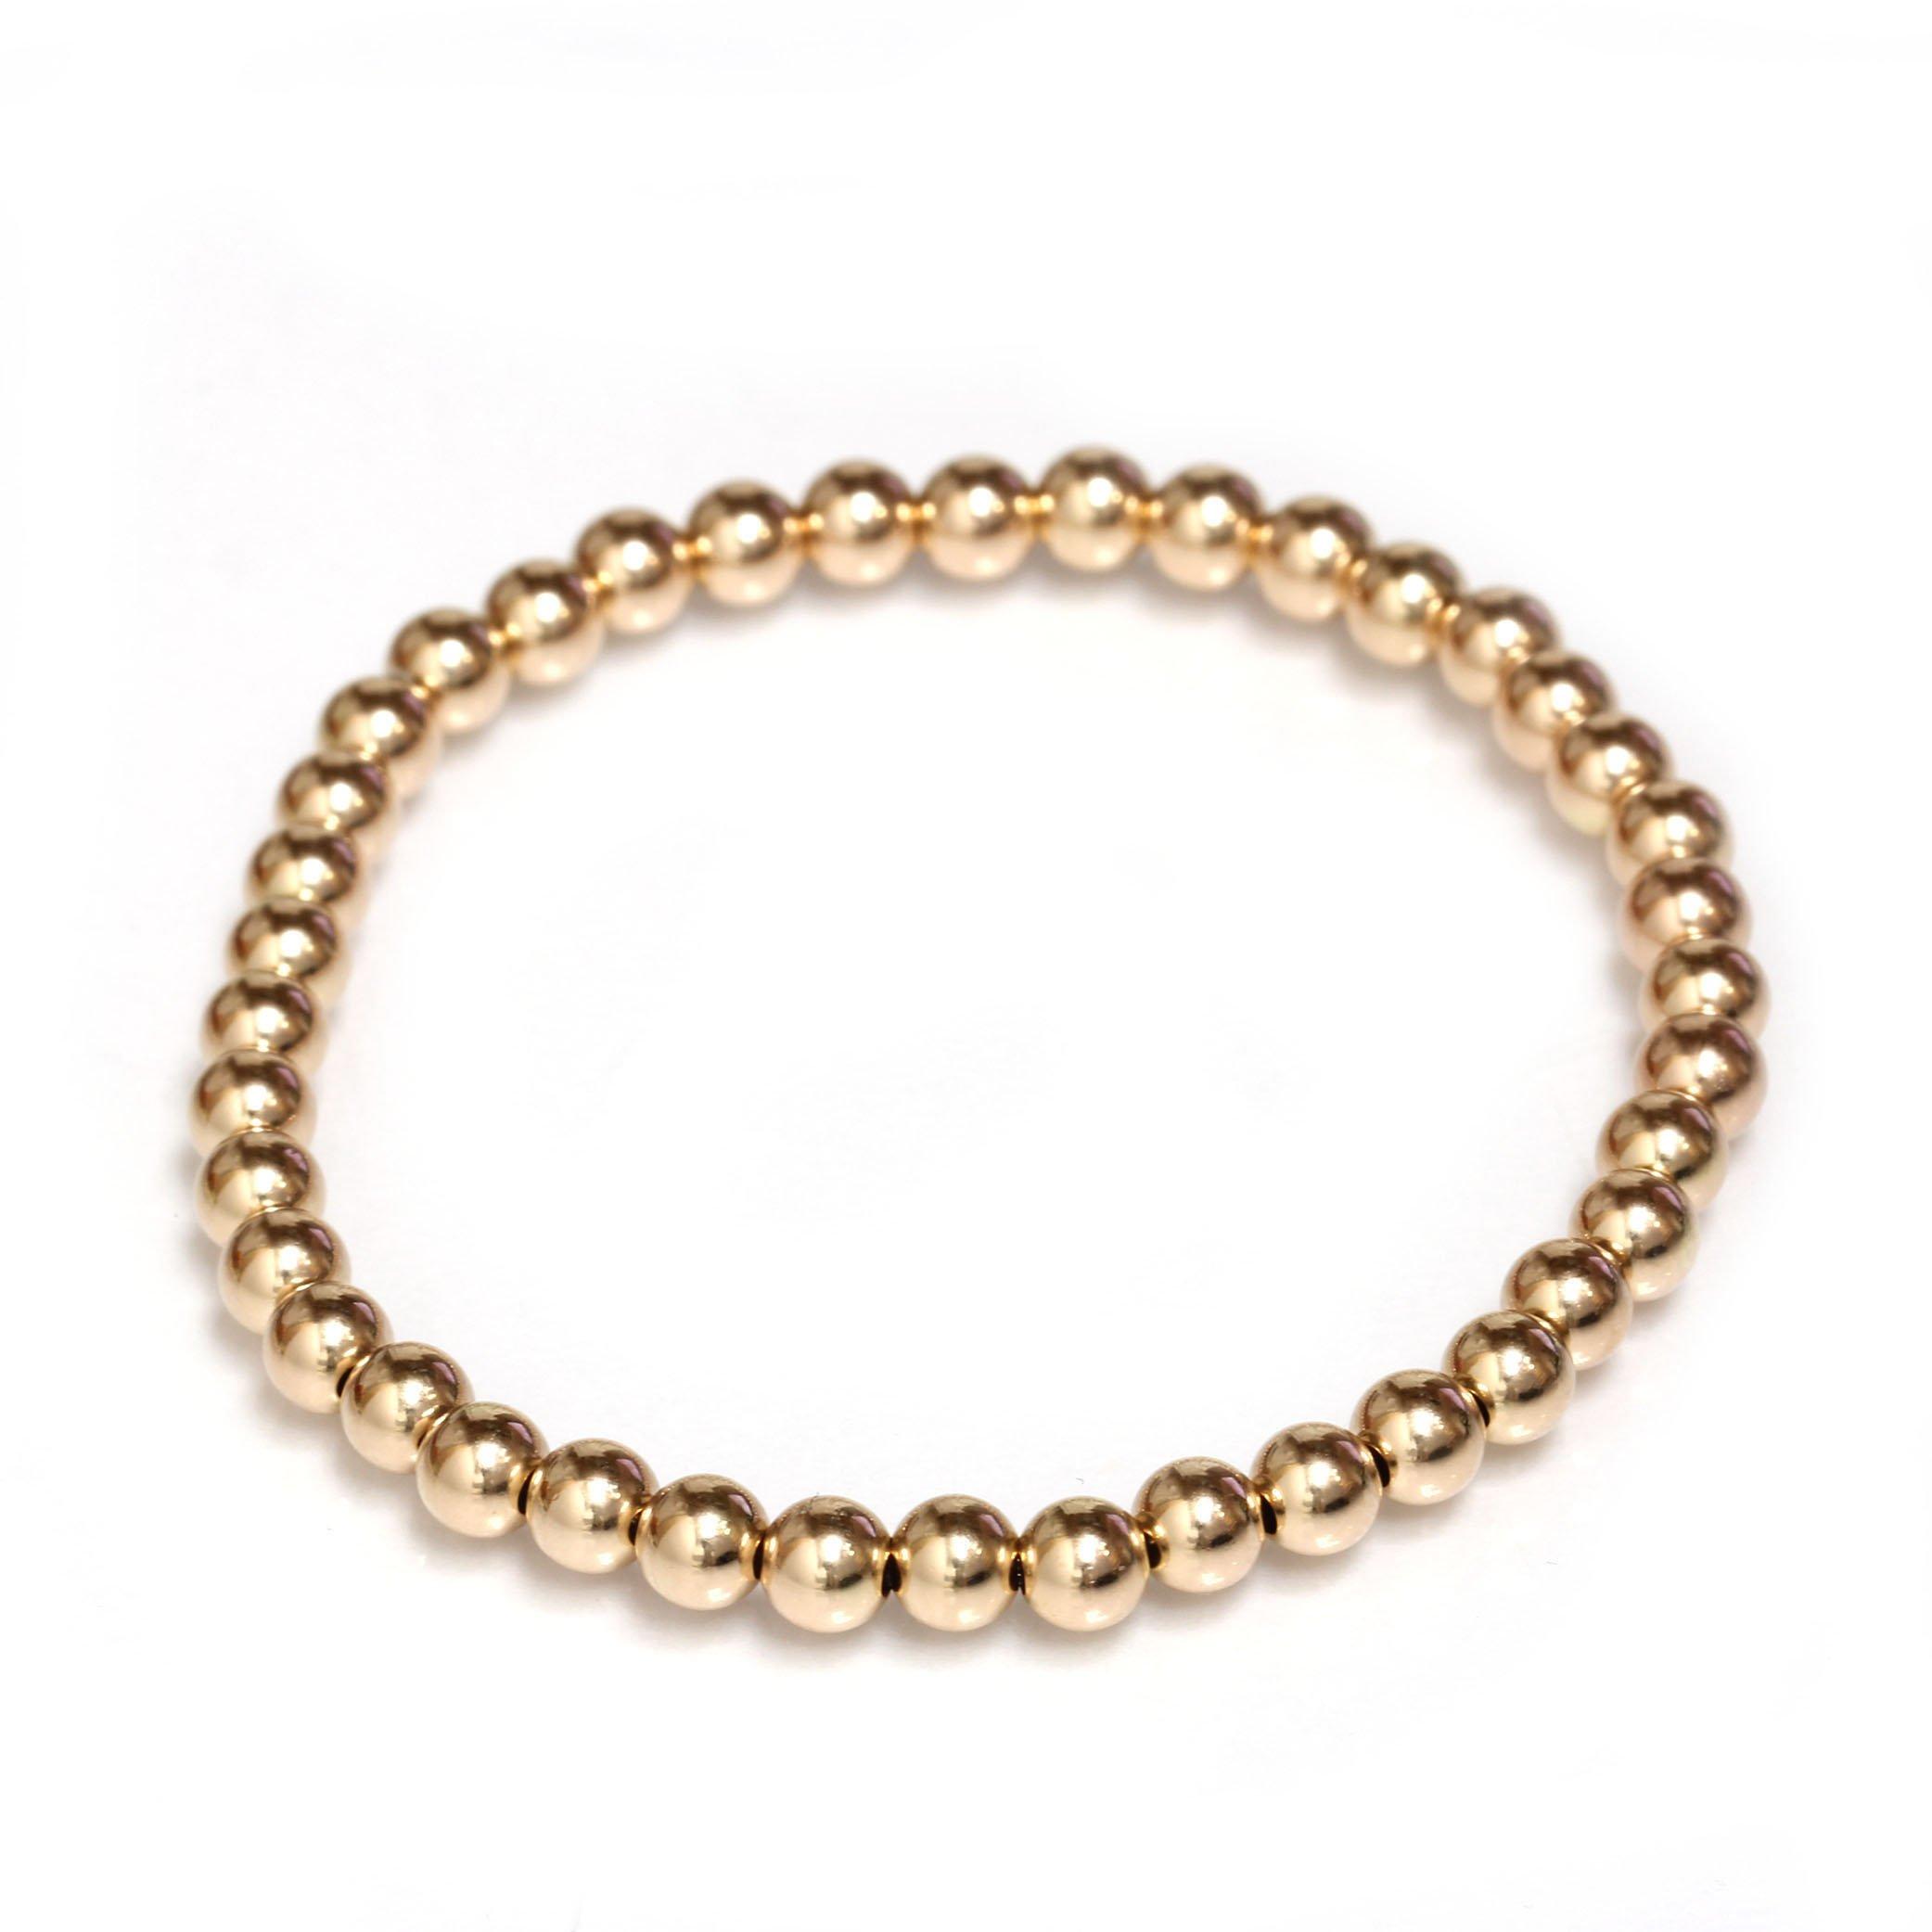 Bead Stretch Elastic Bracelet 14k Gold Yellow, White and Rose, Easy Slid On (7, rose-gold)